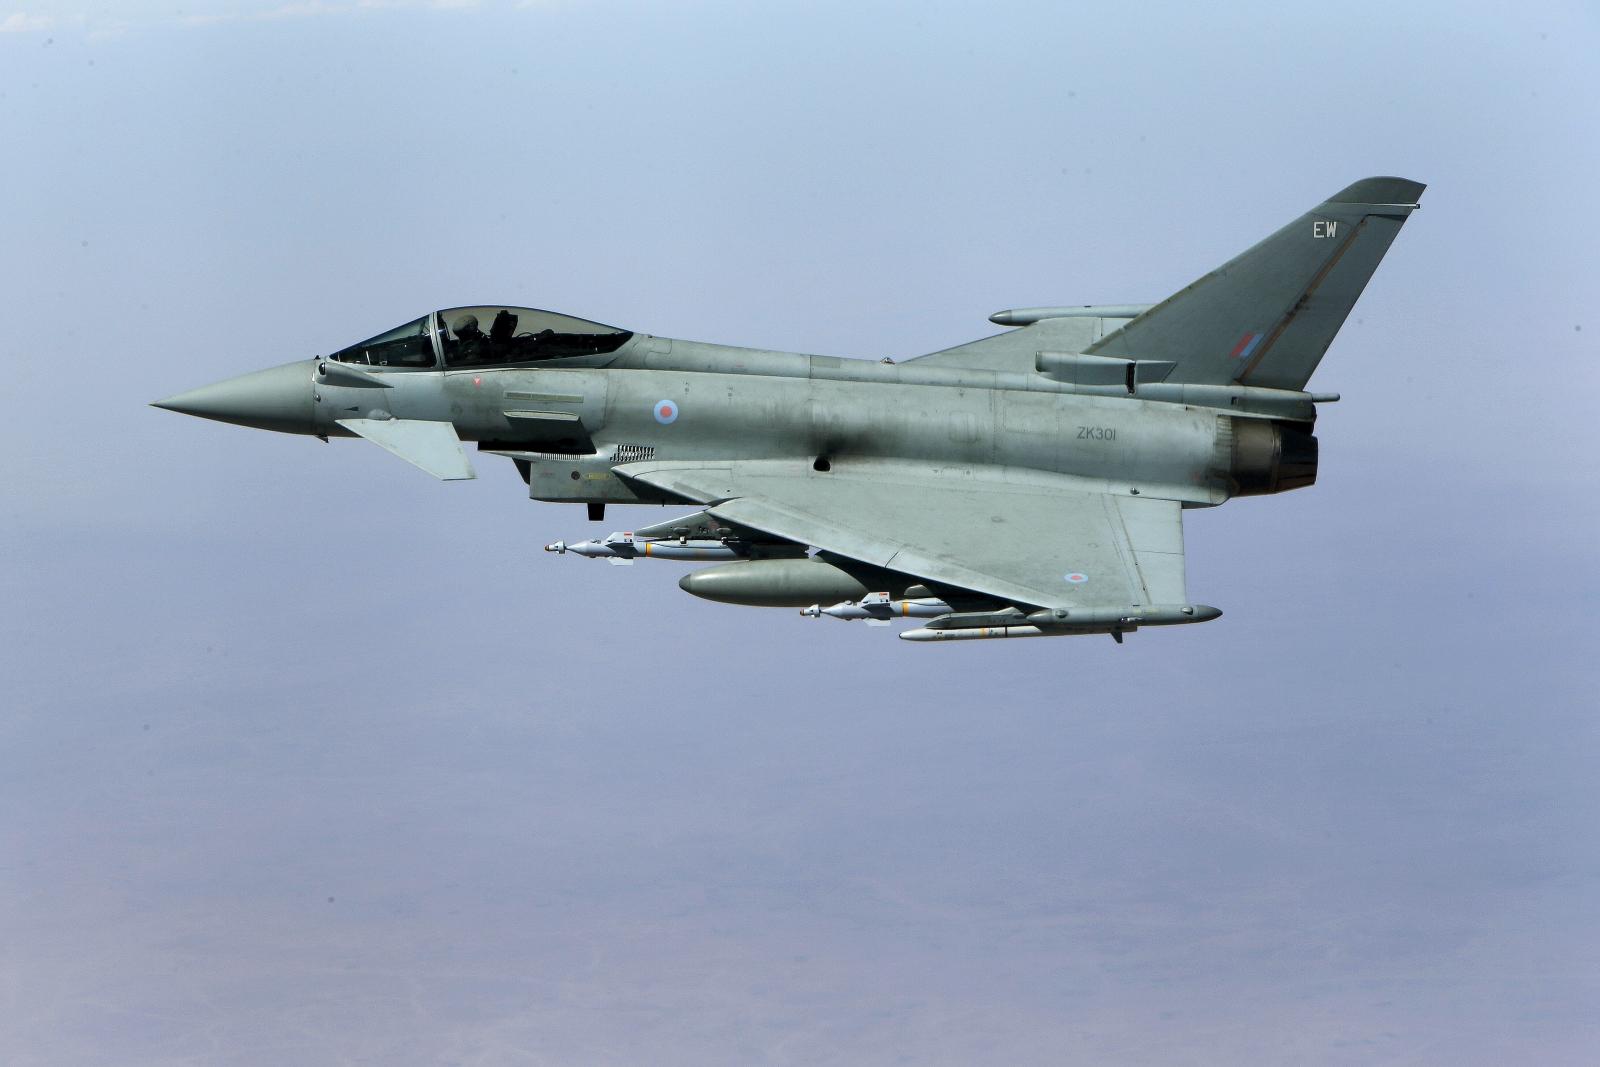 British Typhoon aircraft